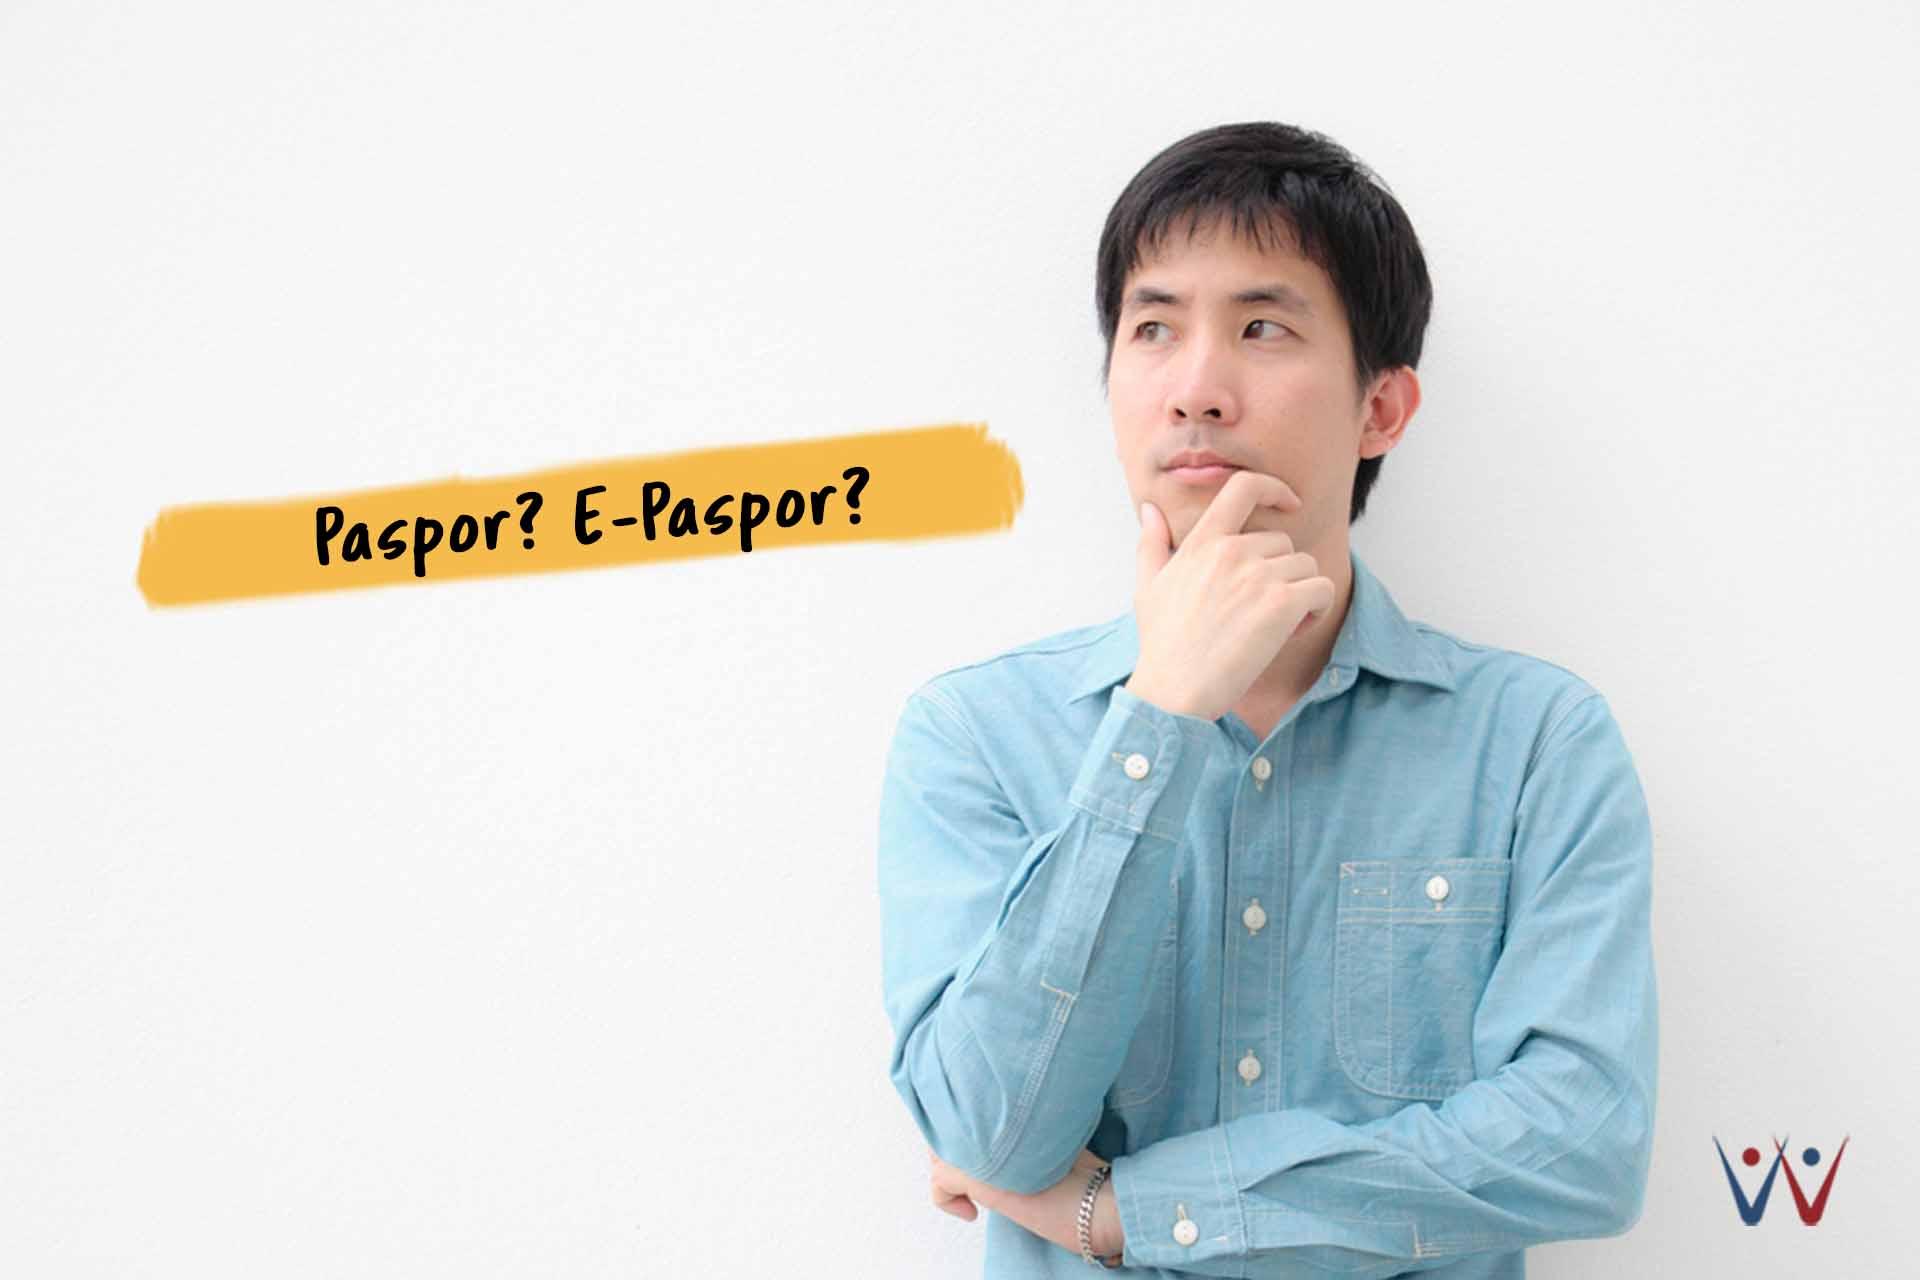 daftar paspor online - perpanjang paspor online - antrian paspor online